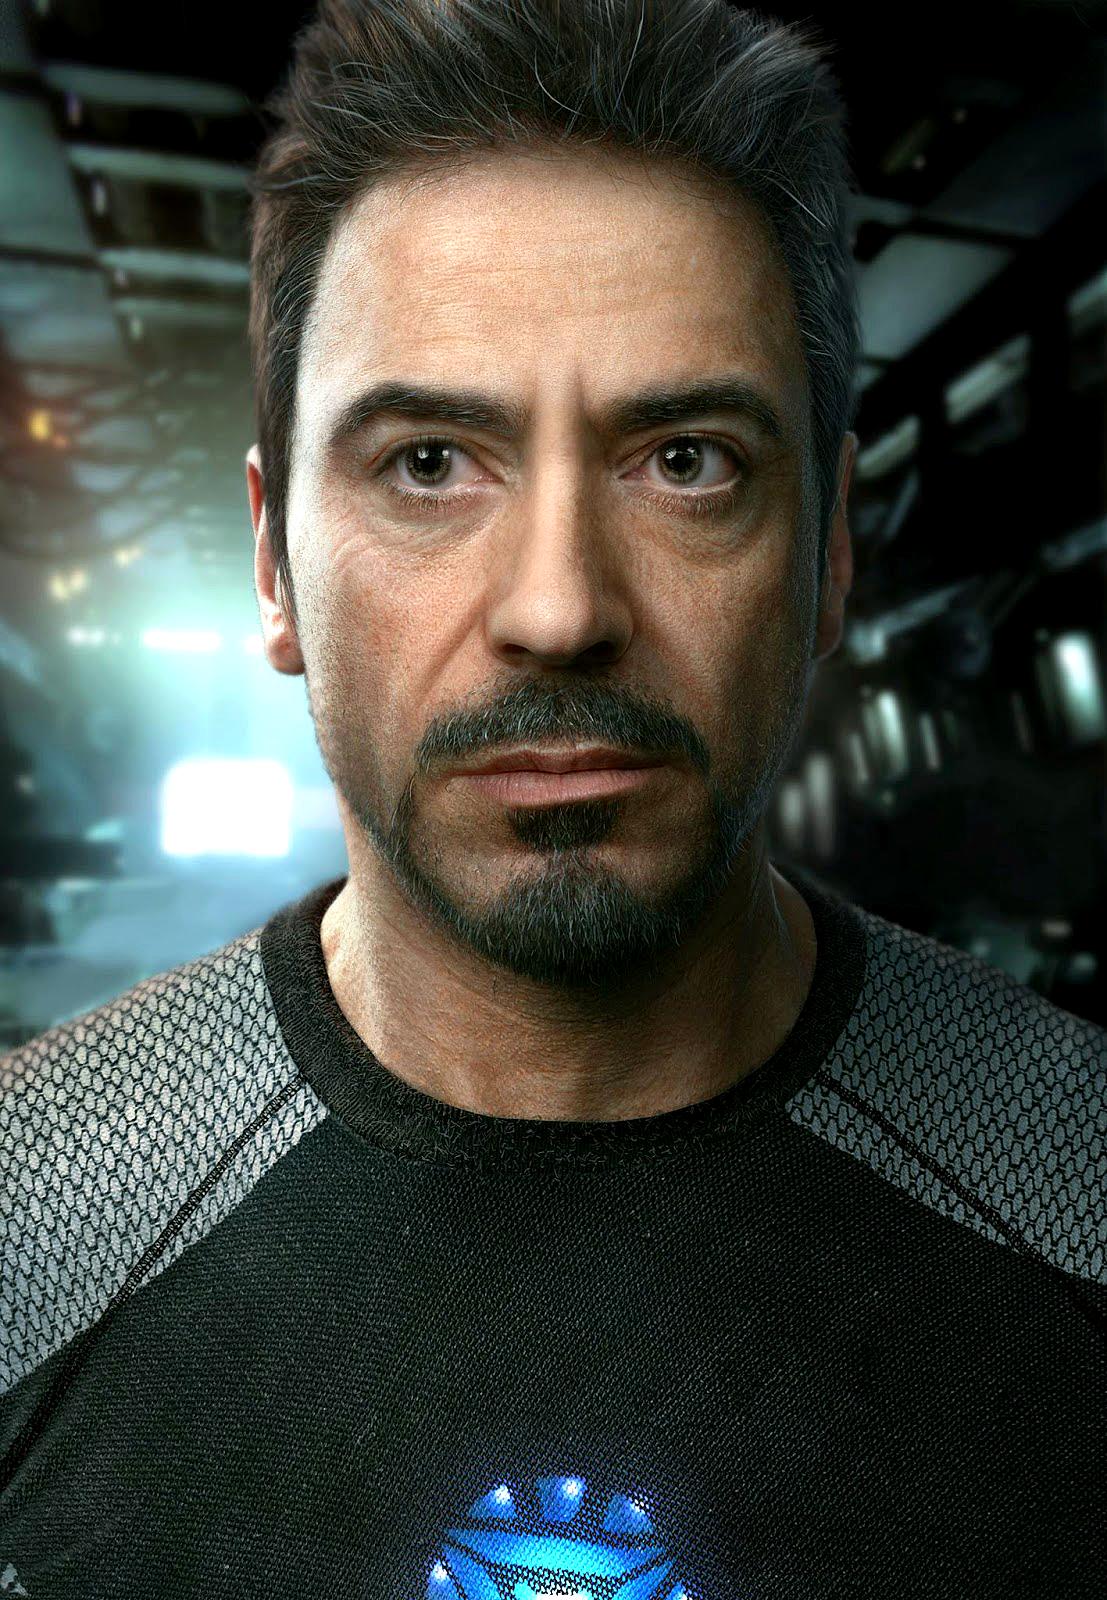 Realistic CG portrait of Robert Downey Jr – by Frank Tzeng and Yibing Jiang